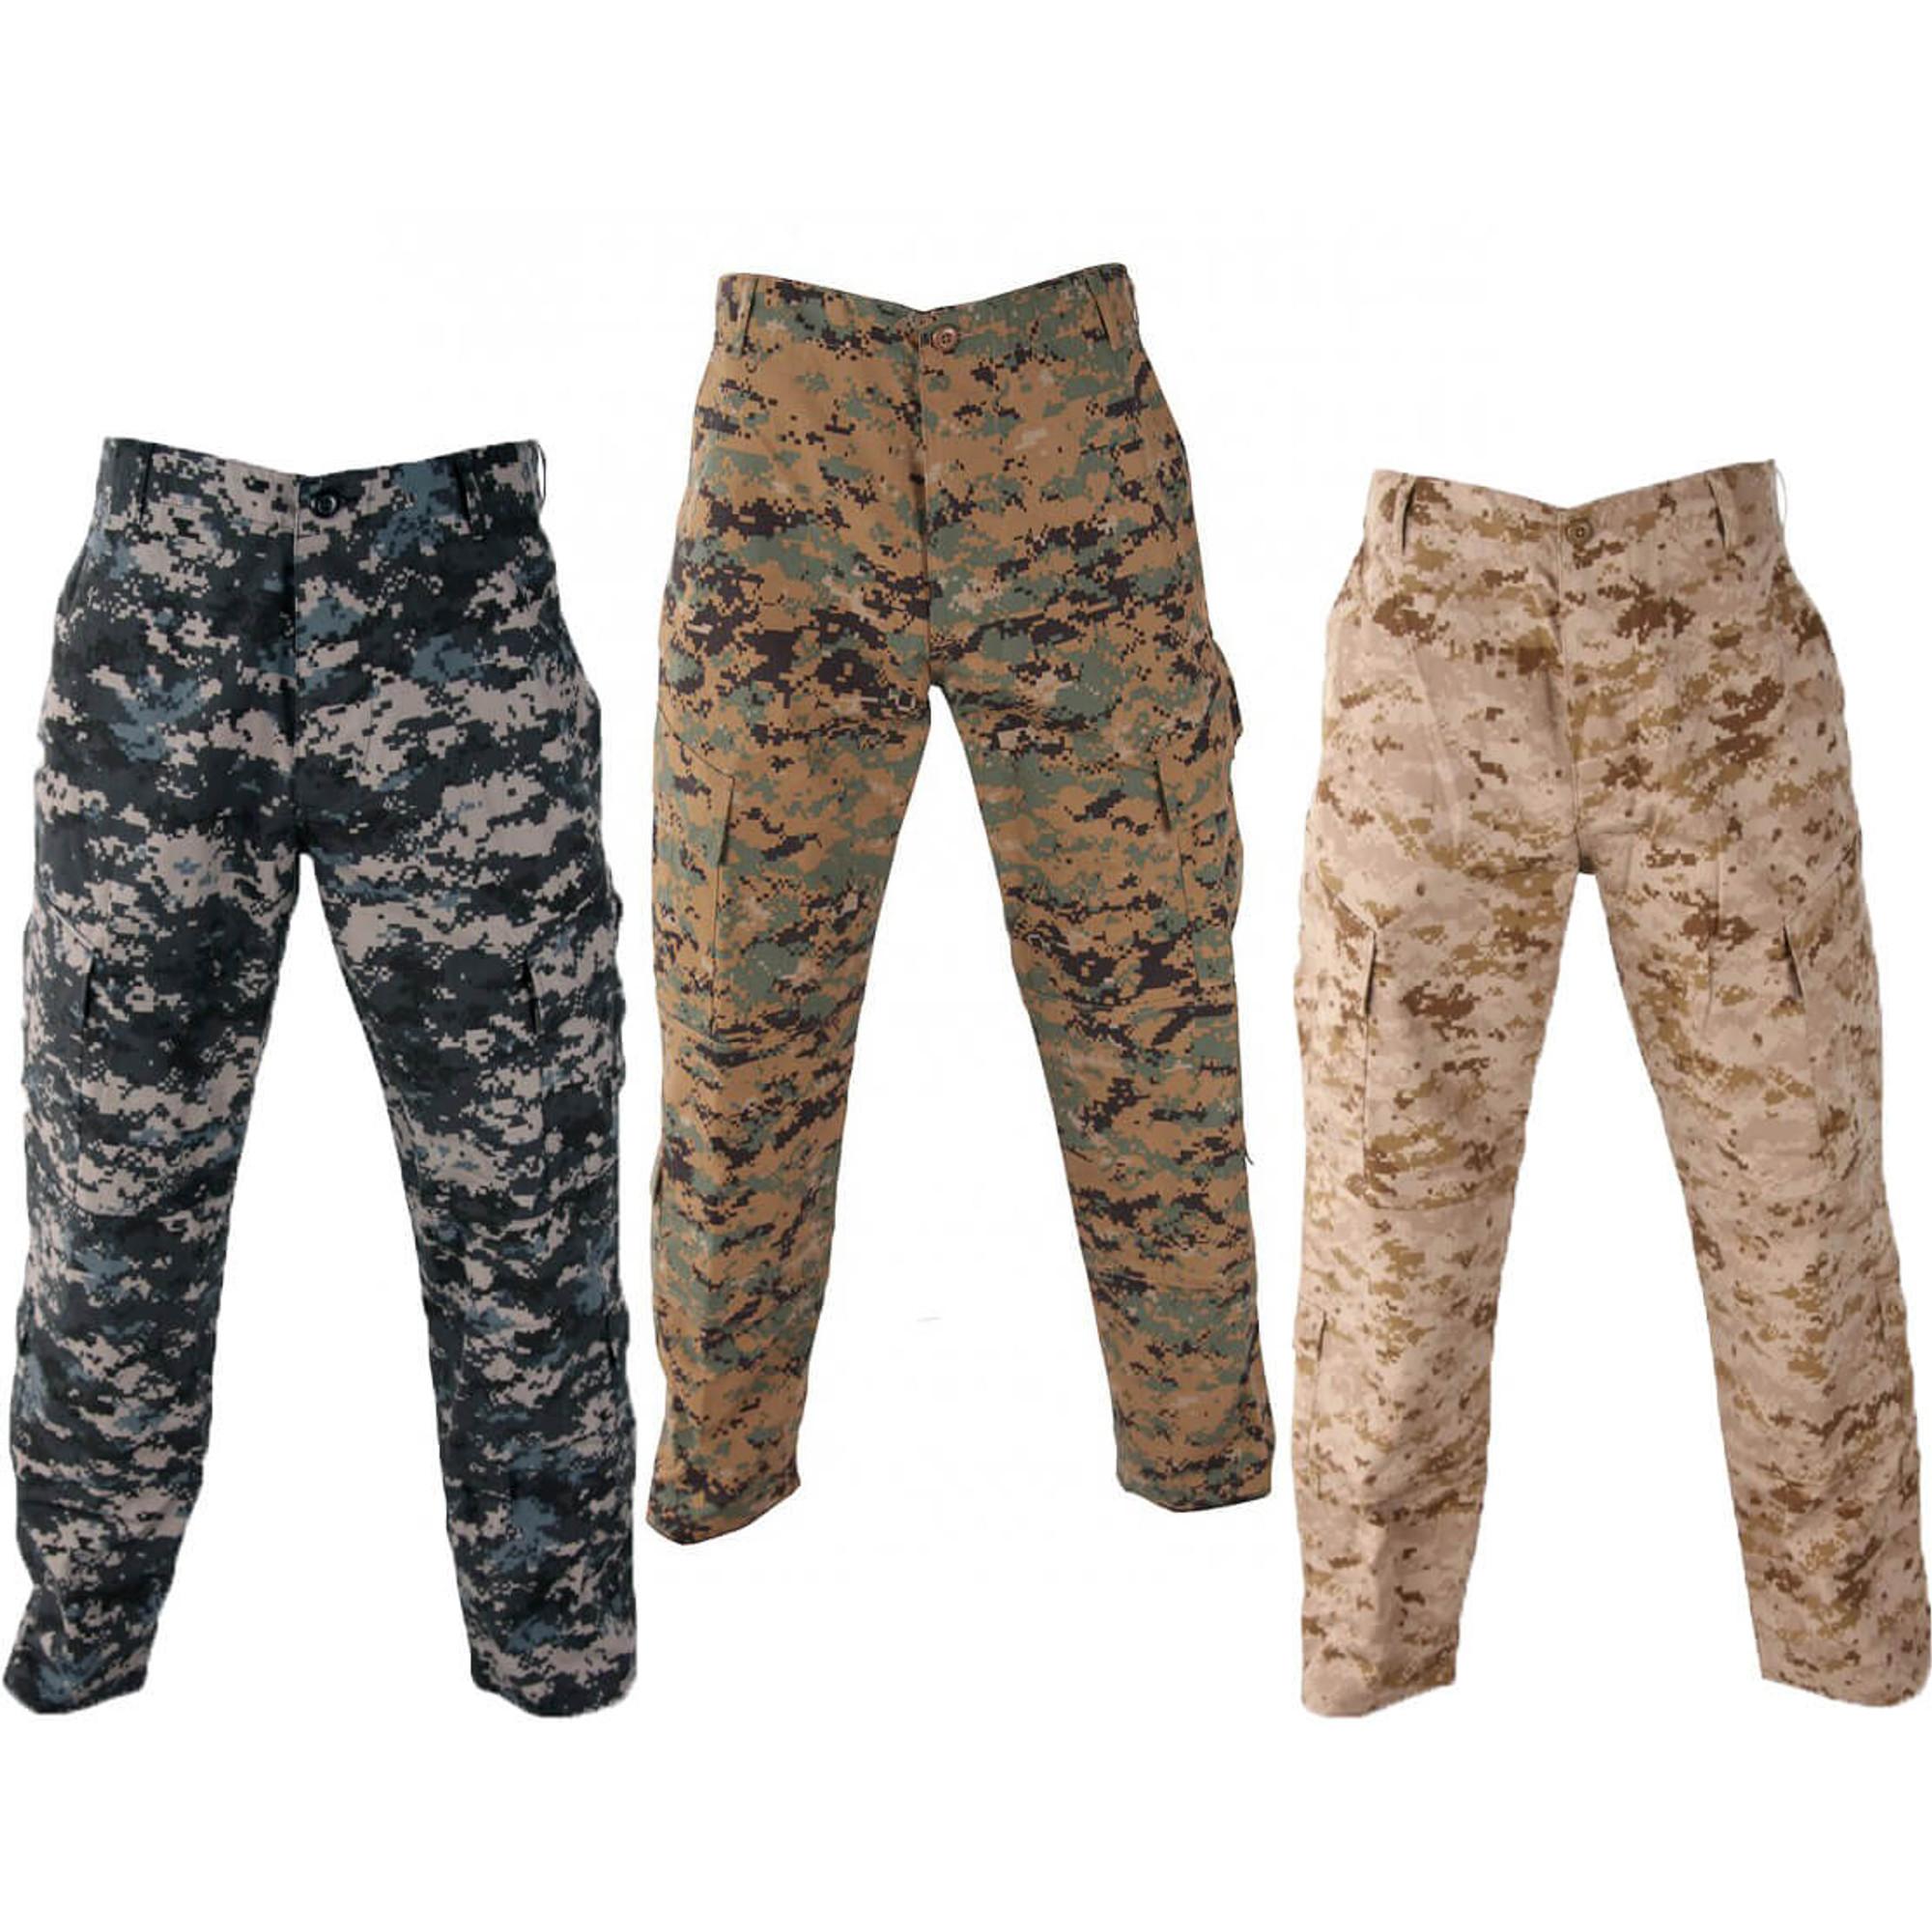 Urban Digital Camo Tactical Military Uniform Pant by PROPPER F5211